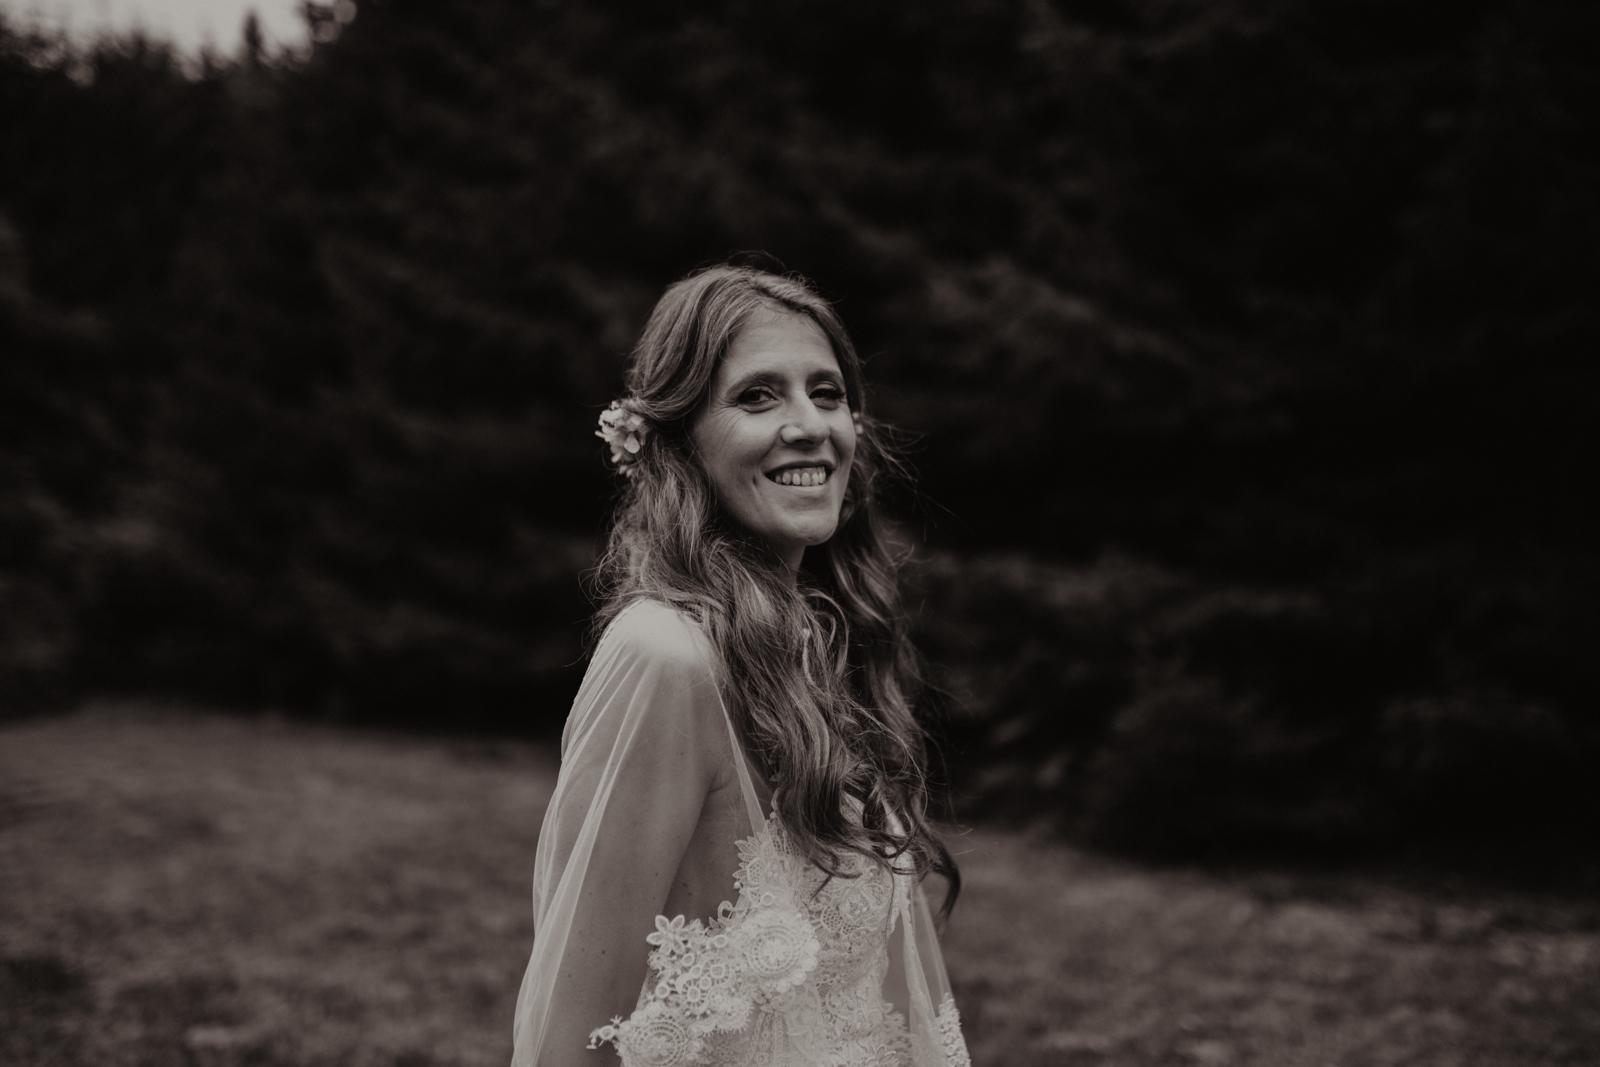 thenortherngirlphotography_photography_thenortherngirl_rebeccascabros_wedding_weddingphotography_weddingphotographer_barcelona_bodaenbarcelona_bodaenmaselmarti_bodarogeryvane-545.jpg